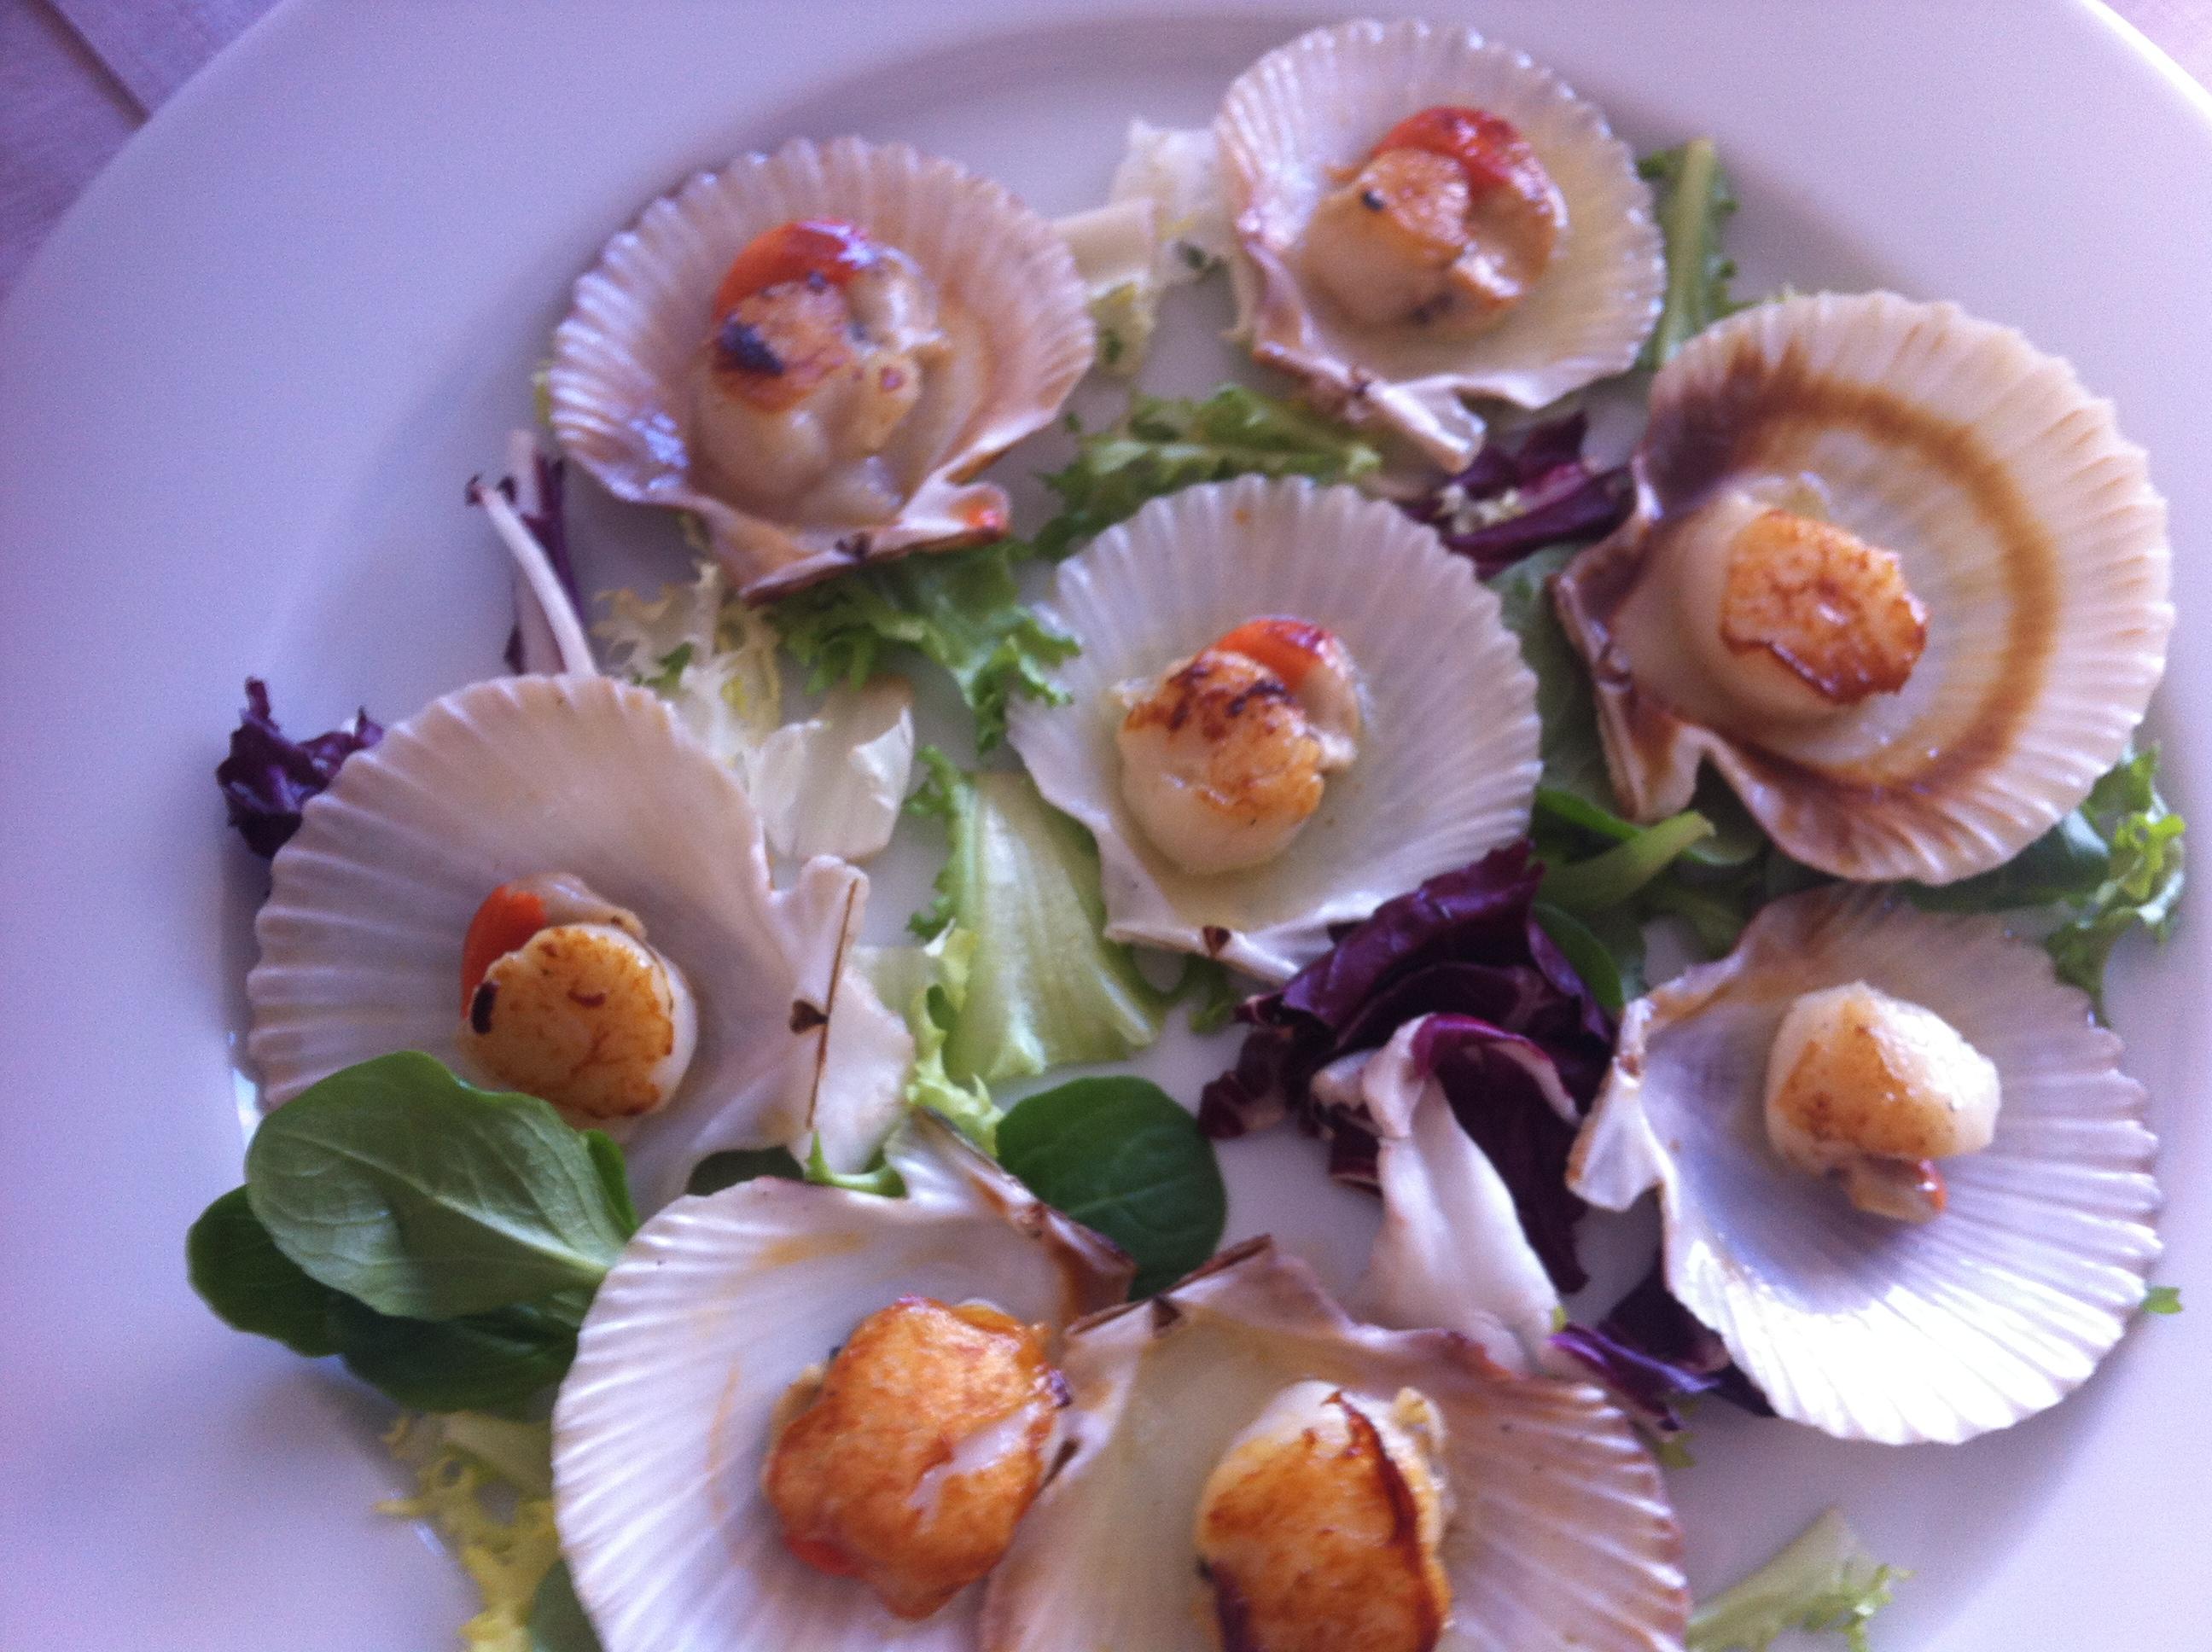 Delikatessen aus Galizien - Restaurante A Chabola in Vigo